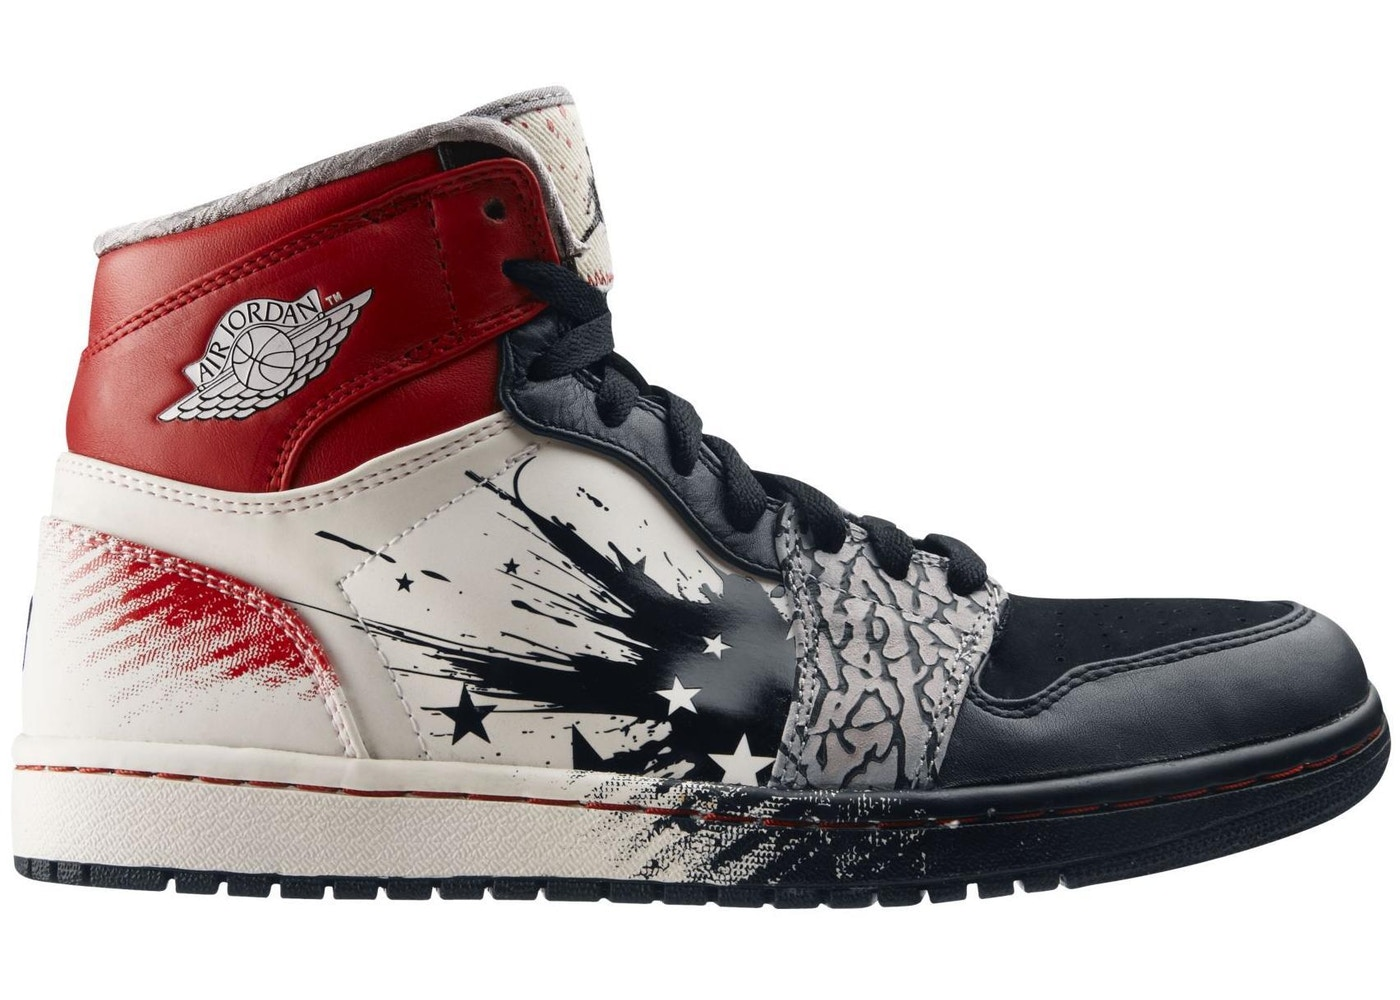 d552e8e492a7d1 Size 14 Shoes - New Highest Bids